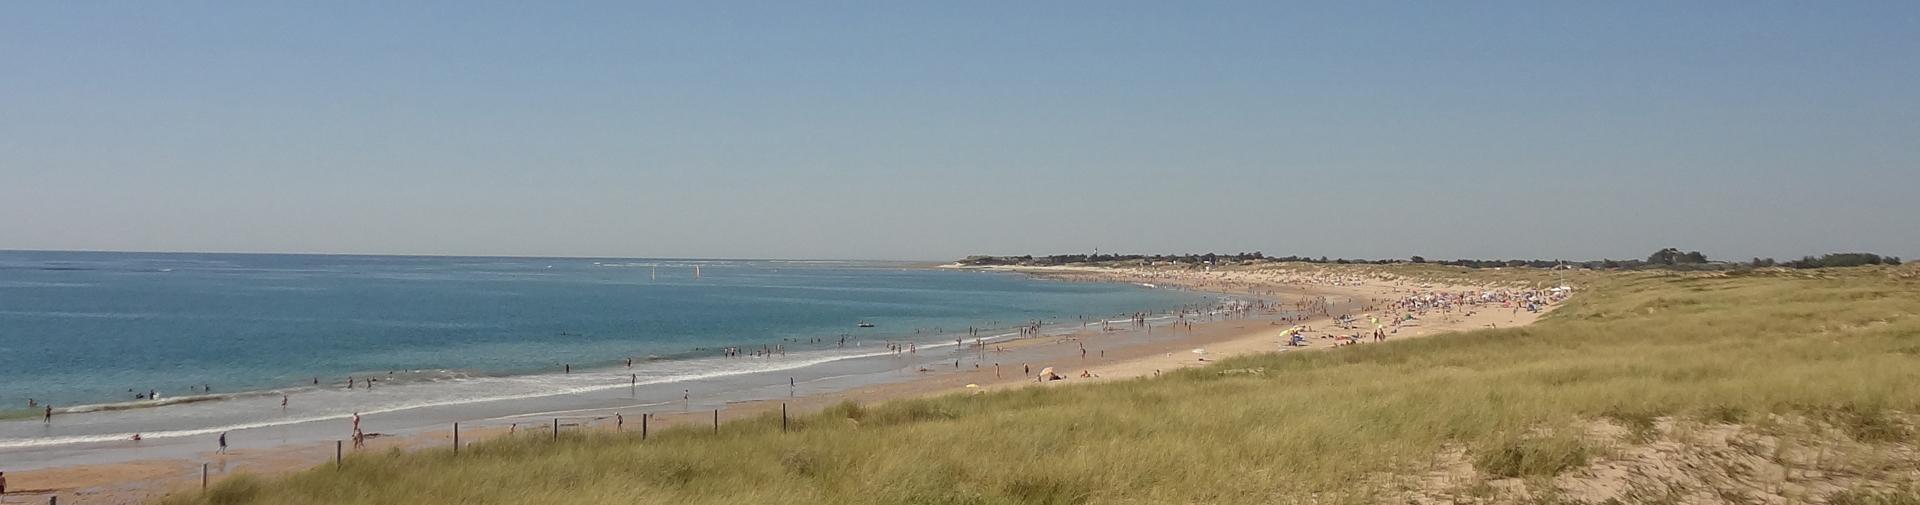 la-plage-a-400m-camping-ile-d-oleron